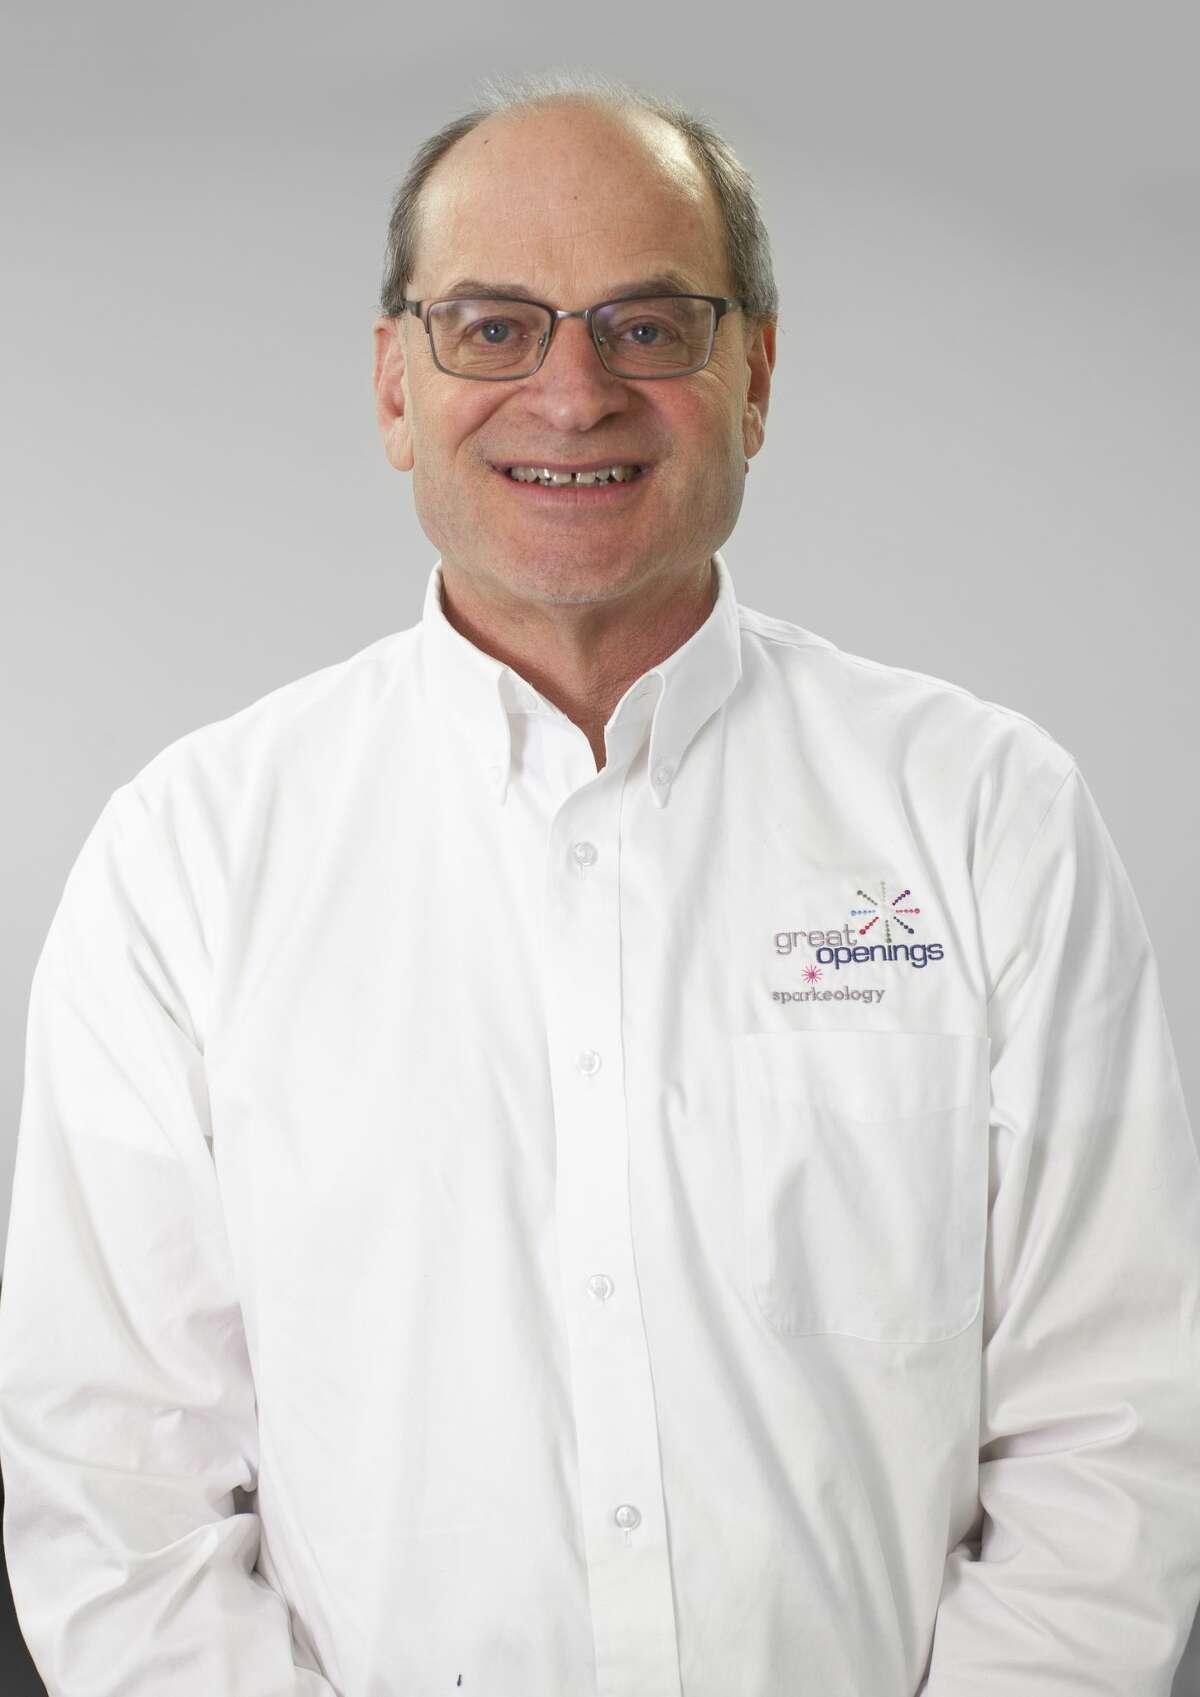 Steve Paine